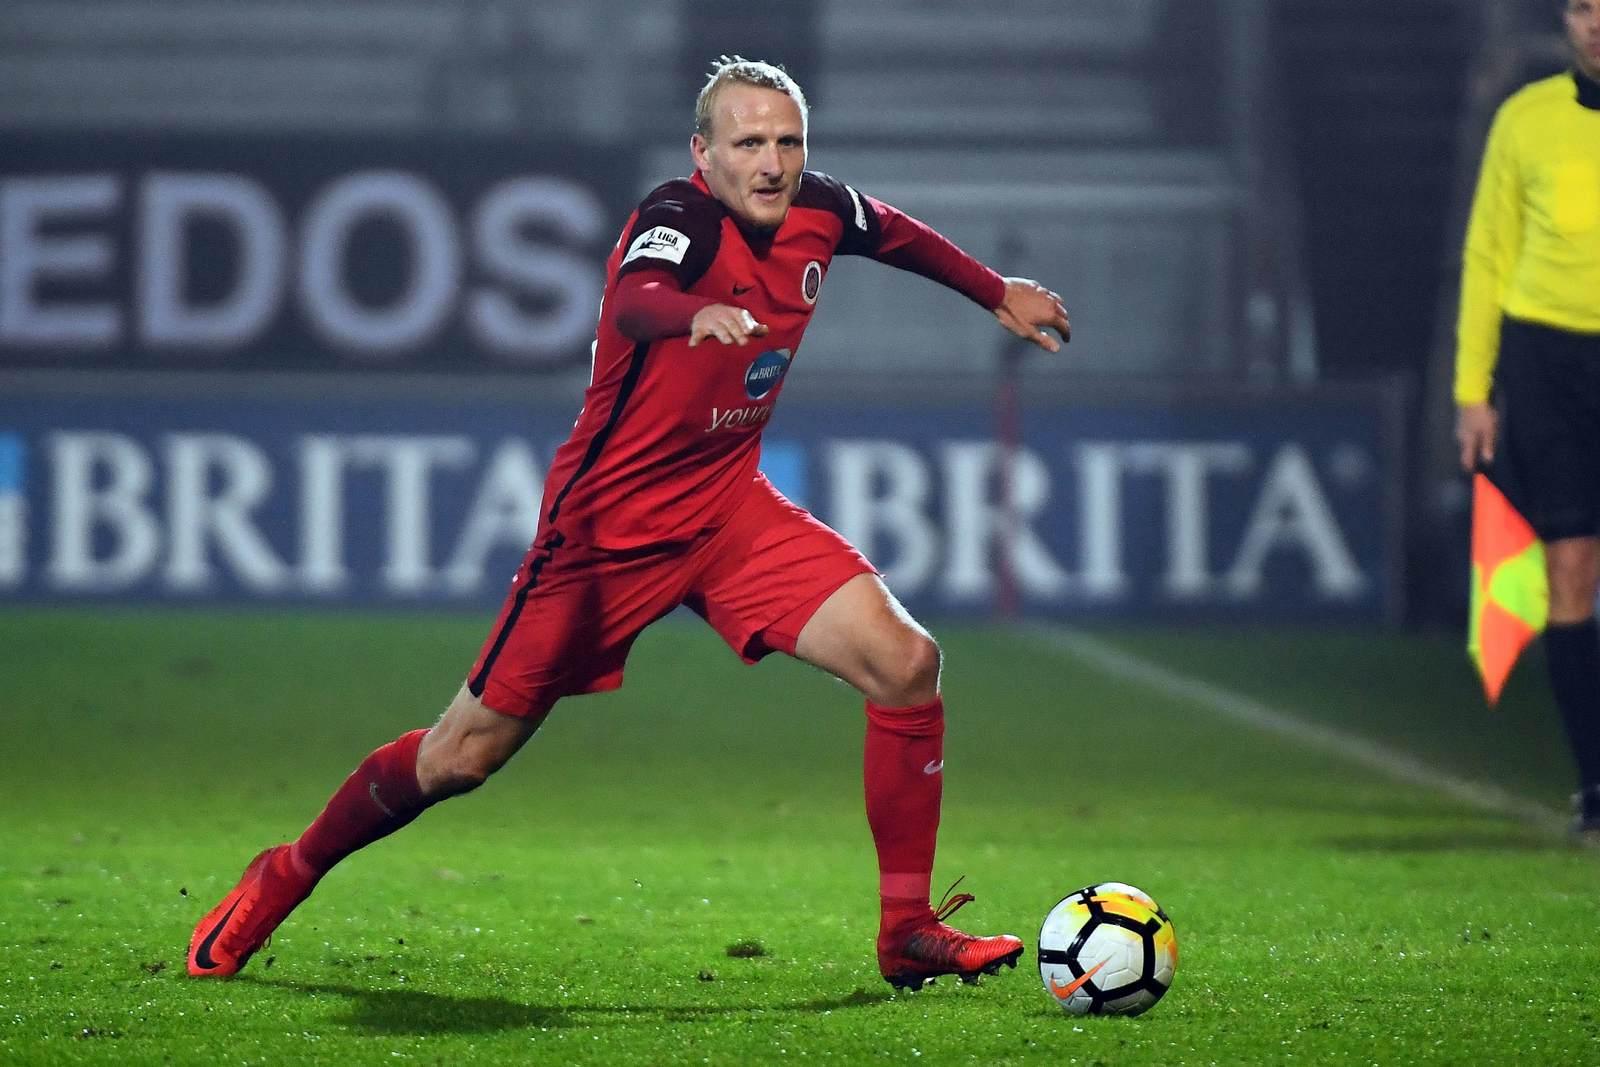 Alf Mintzel am Ball für den SV Wehen Wiesbaden